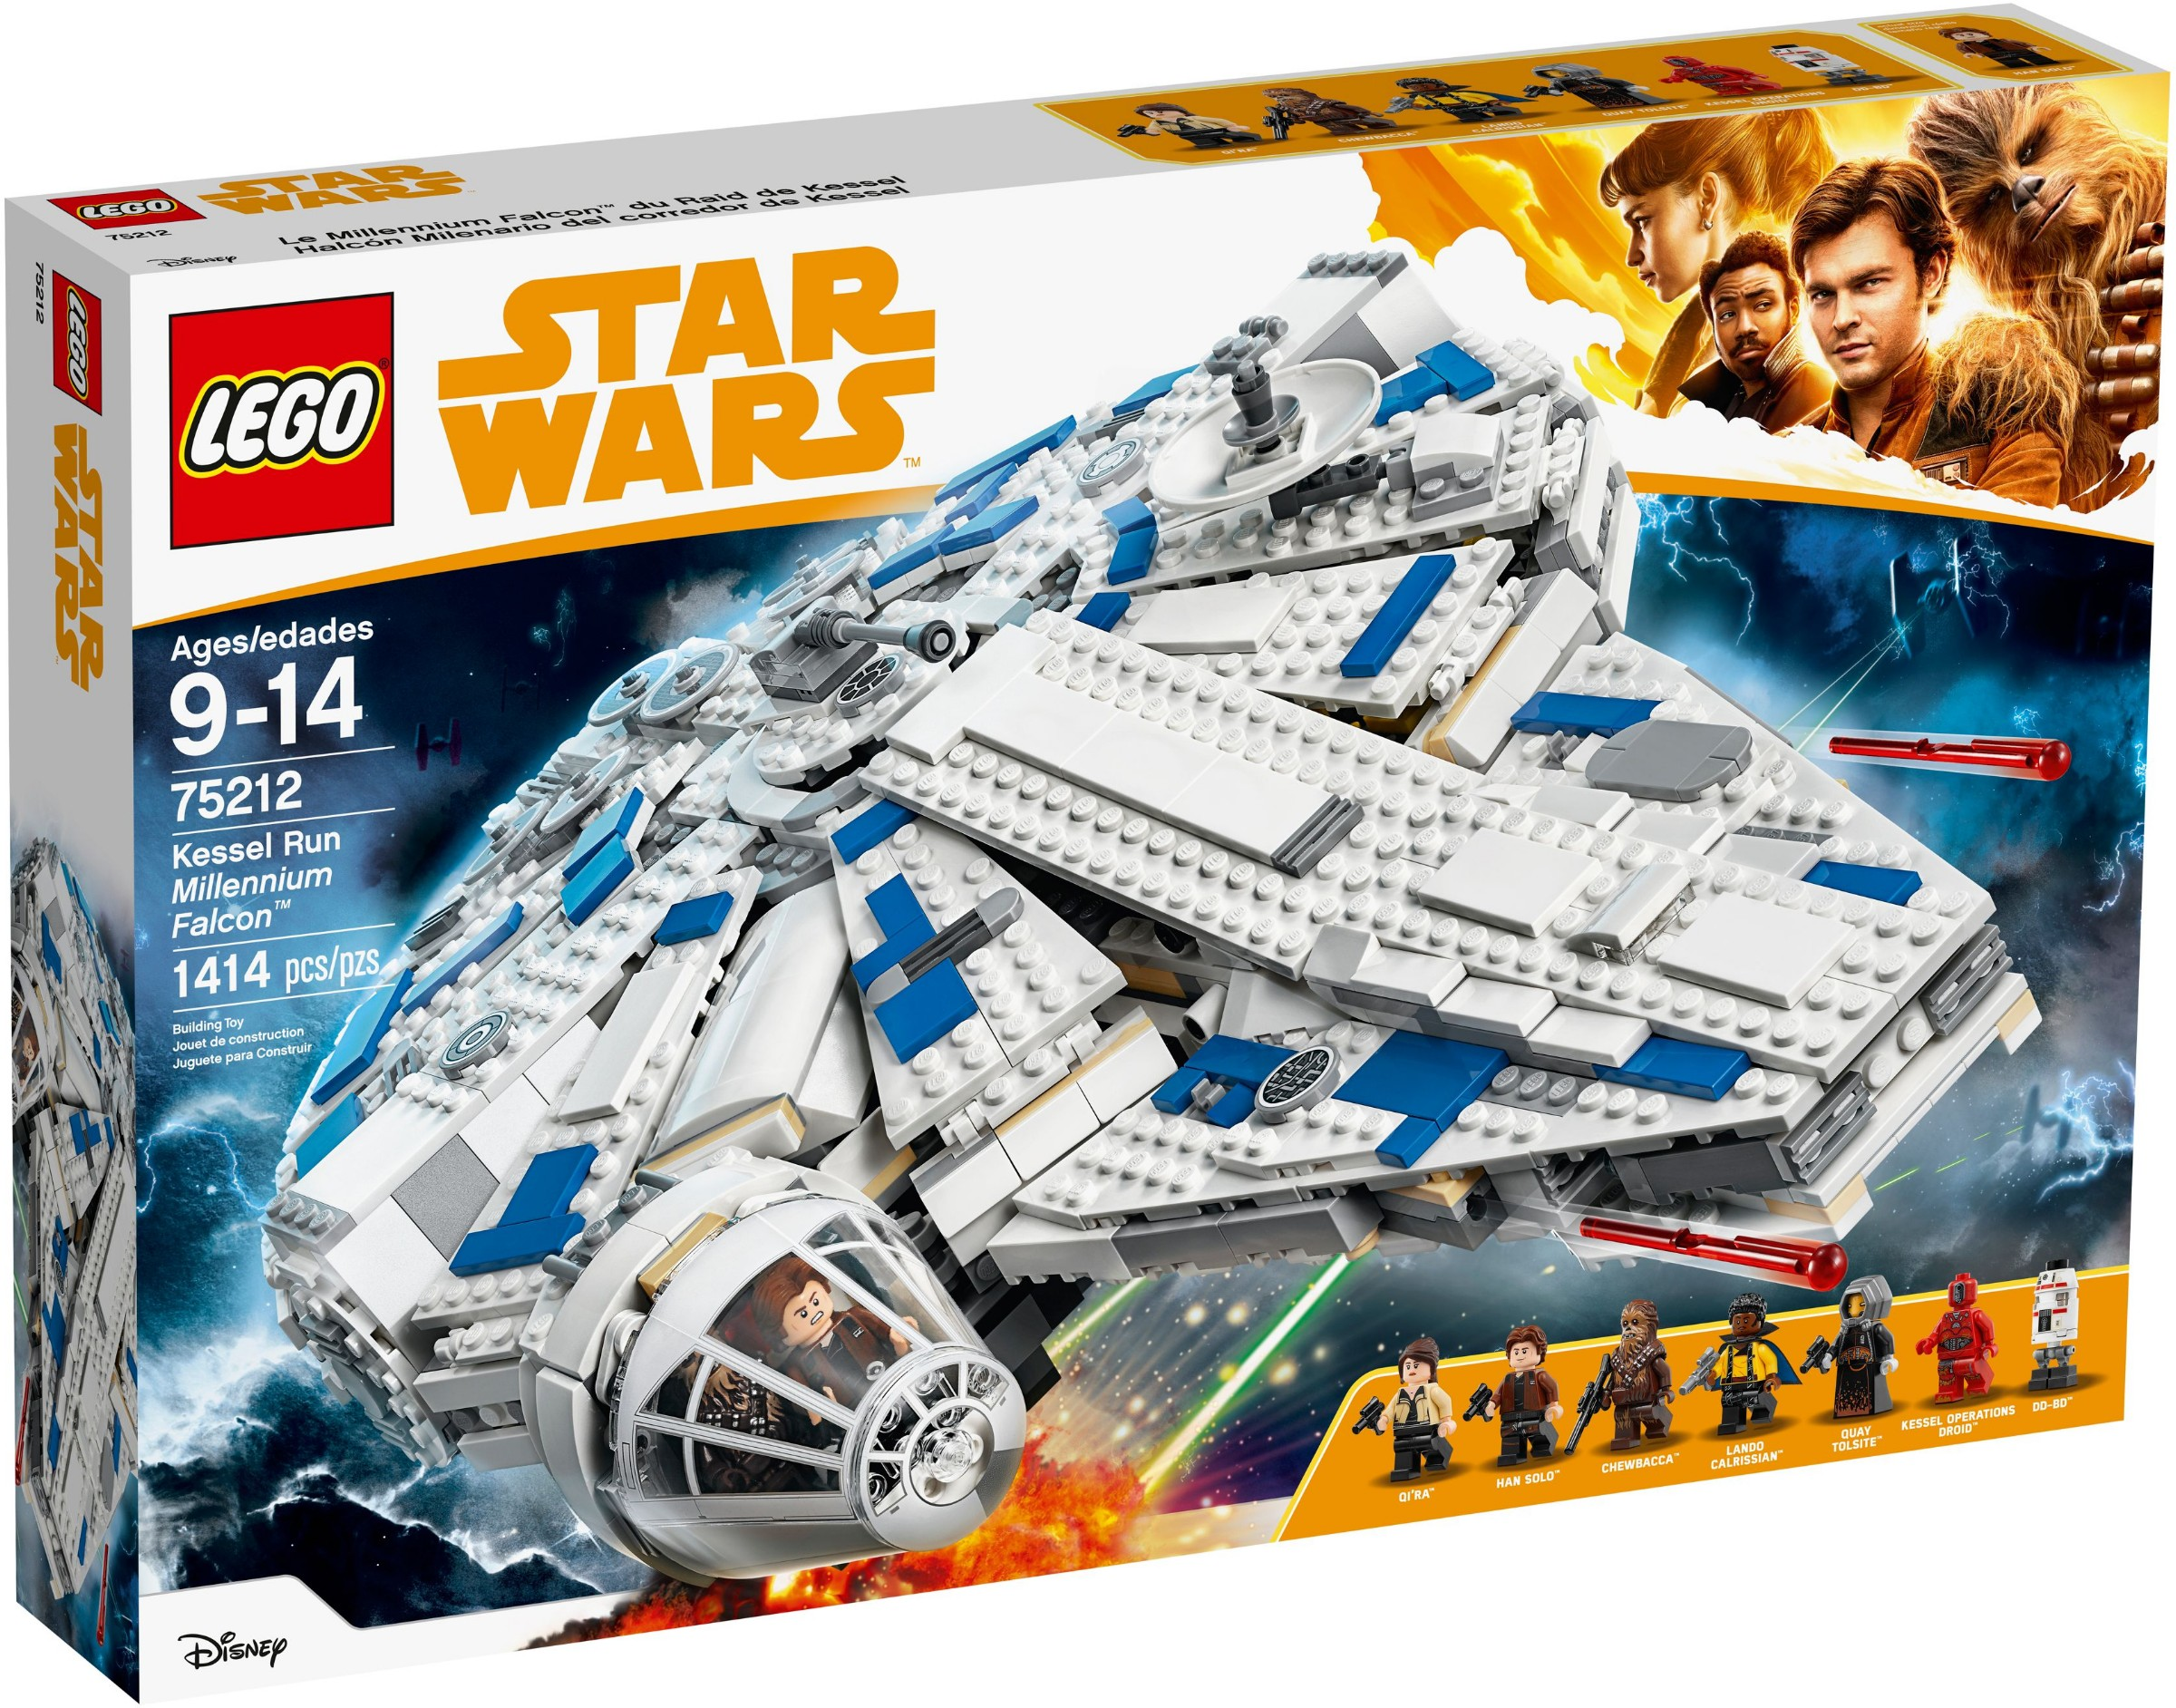 Lego Star Wars Han Solo Lando /& Calrissian Minifigure Millennium Falcon 75212